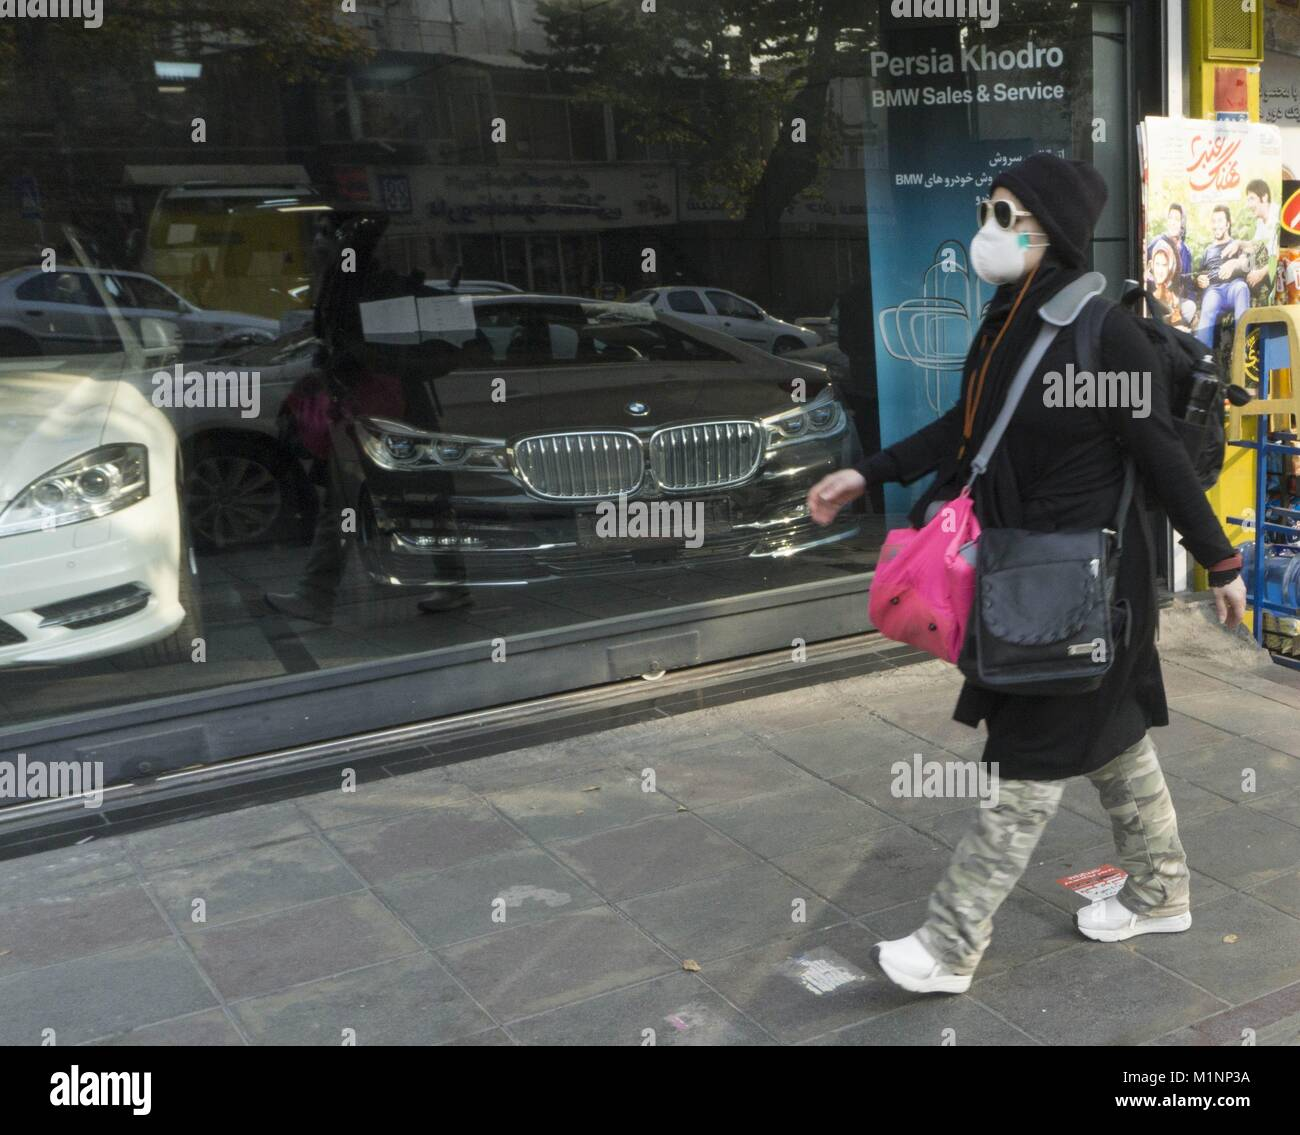 Car Dealerships From Past: A Street Scene In Tehran Stock Photos & A Street Scene In